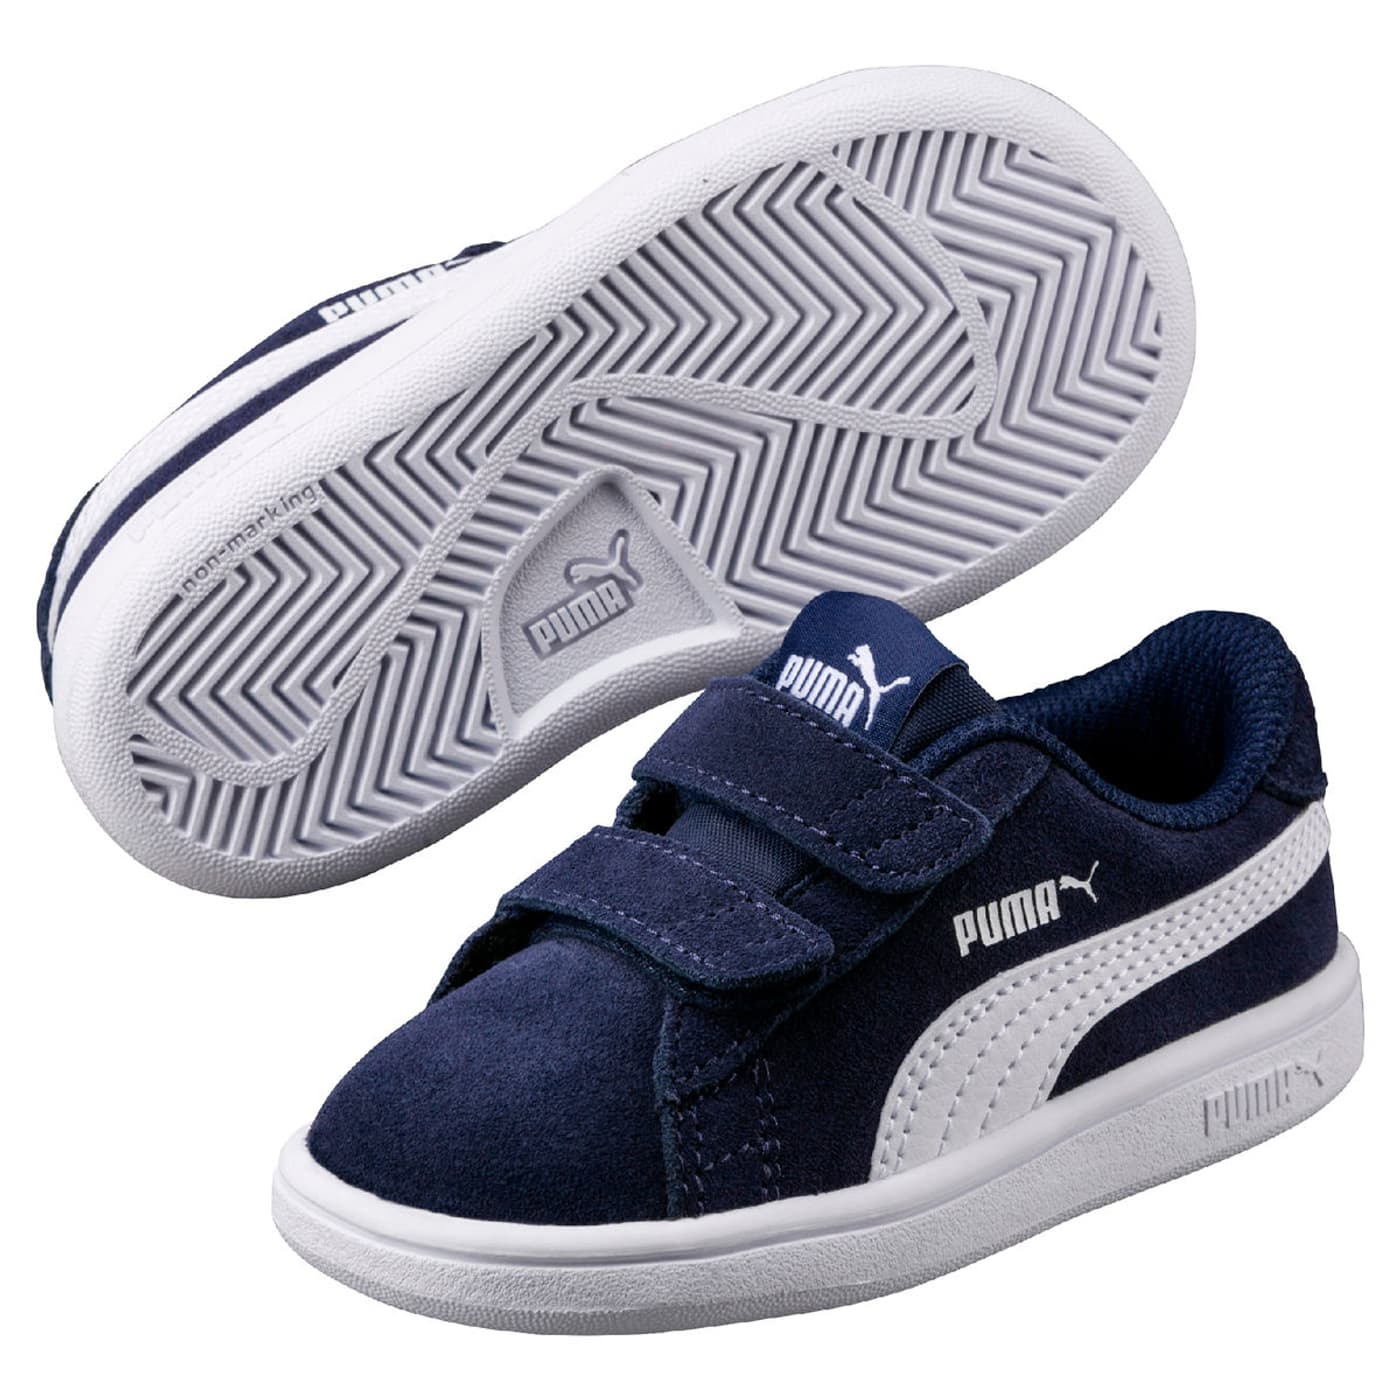 208b63c22e26f Chaussures Puma Chaussures Migros Enfant Pour Puma Pour Enfant Migros  qaxTfq1